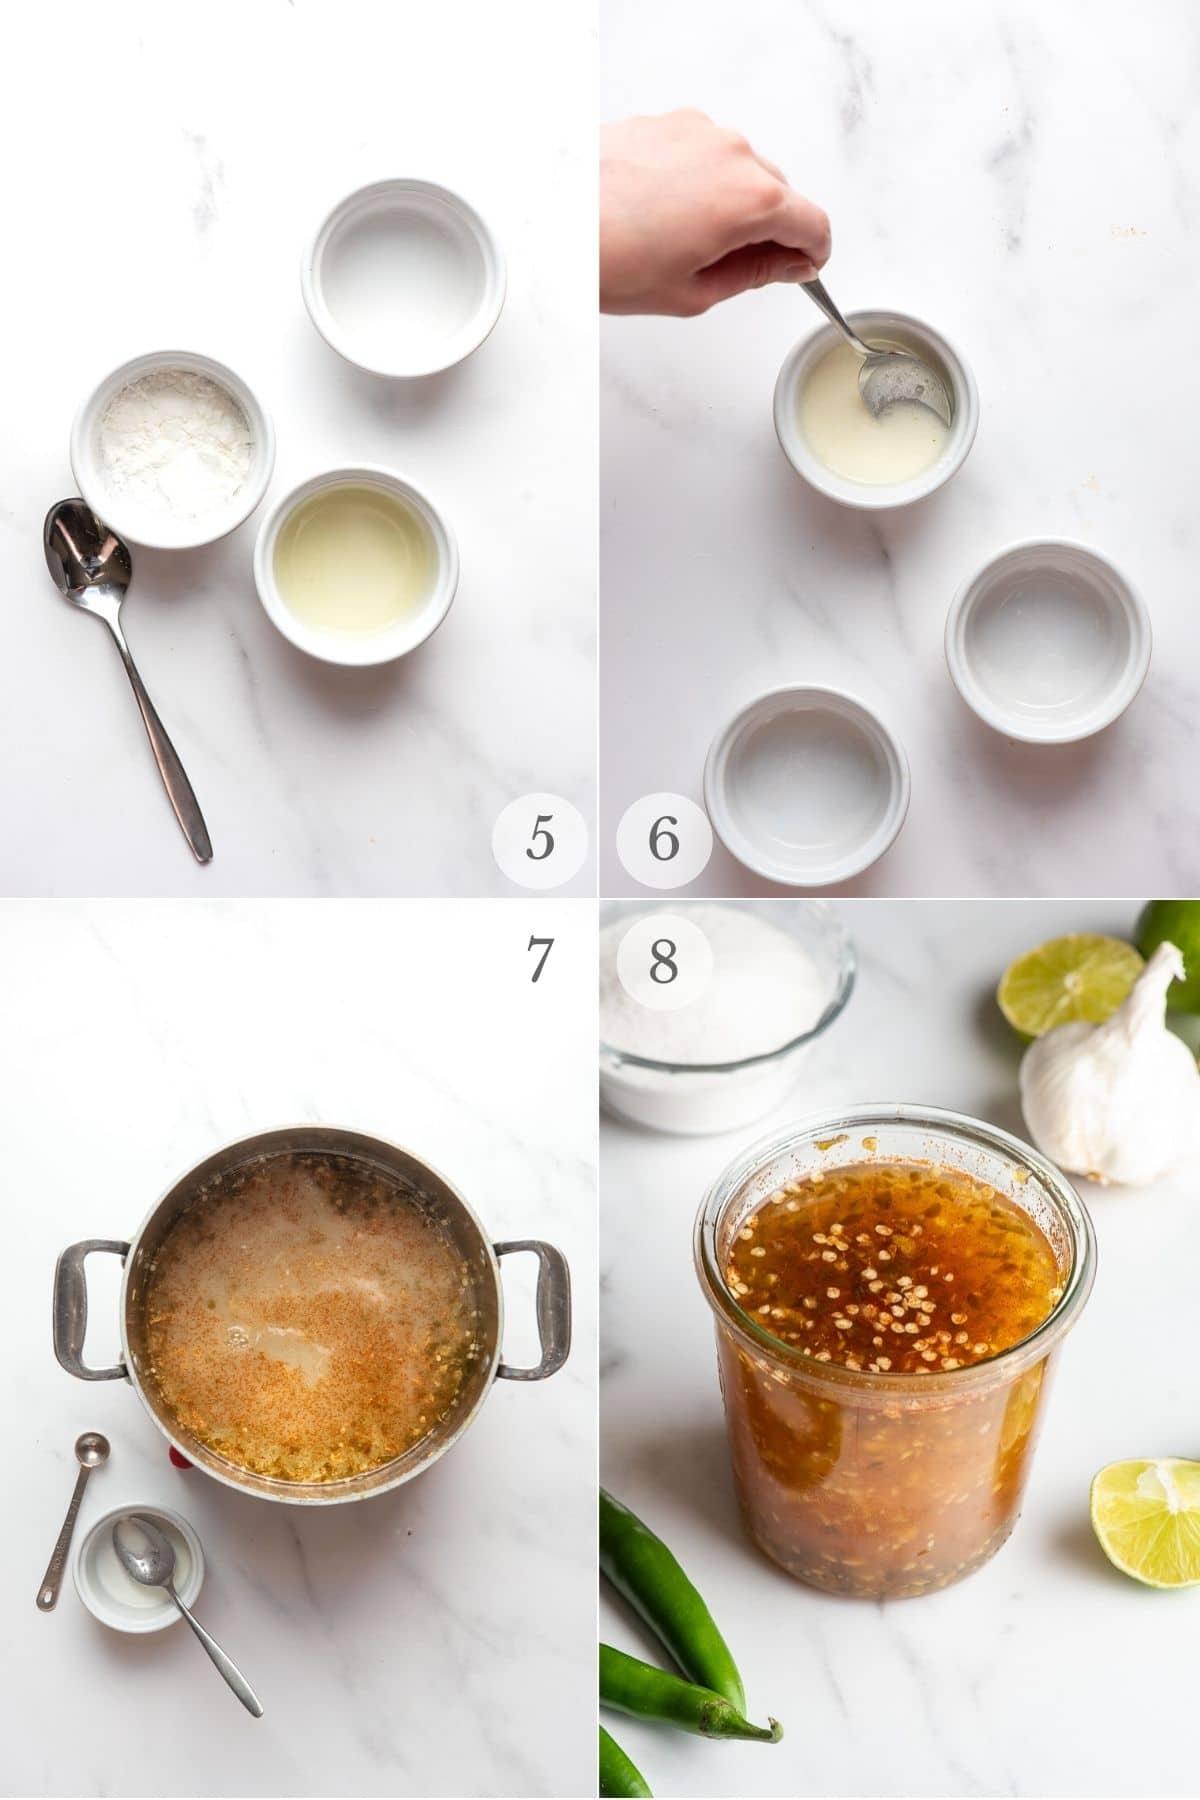 thai sweet chili sauce recipe steps 5-8